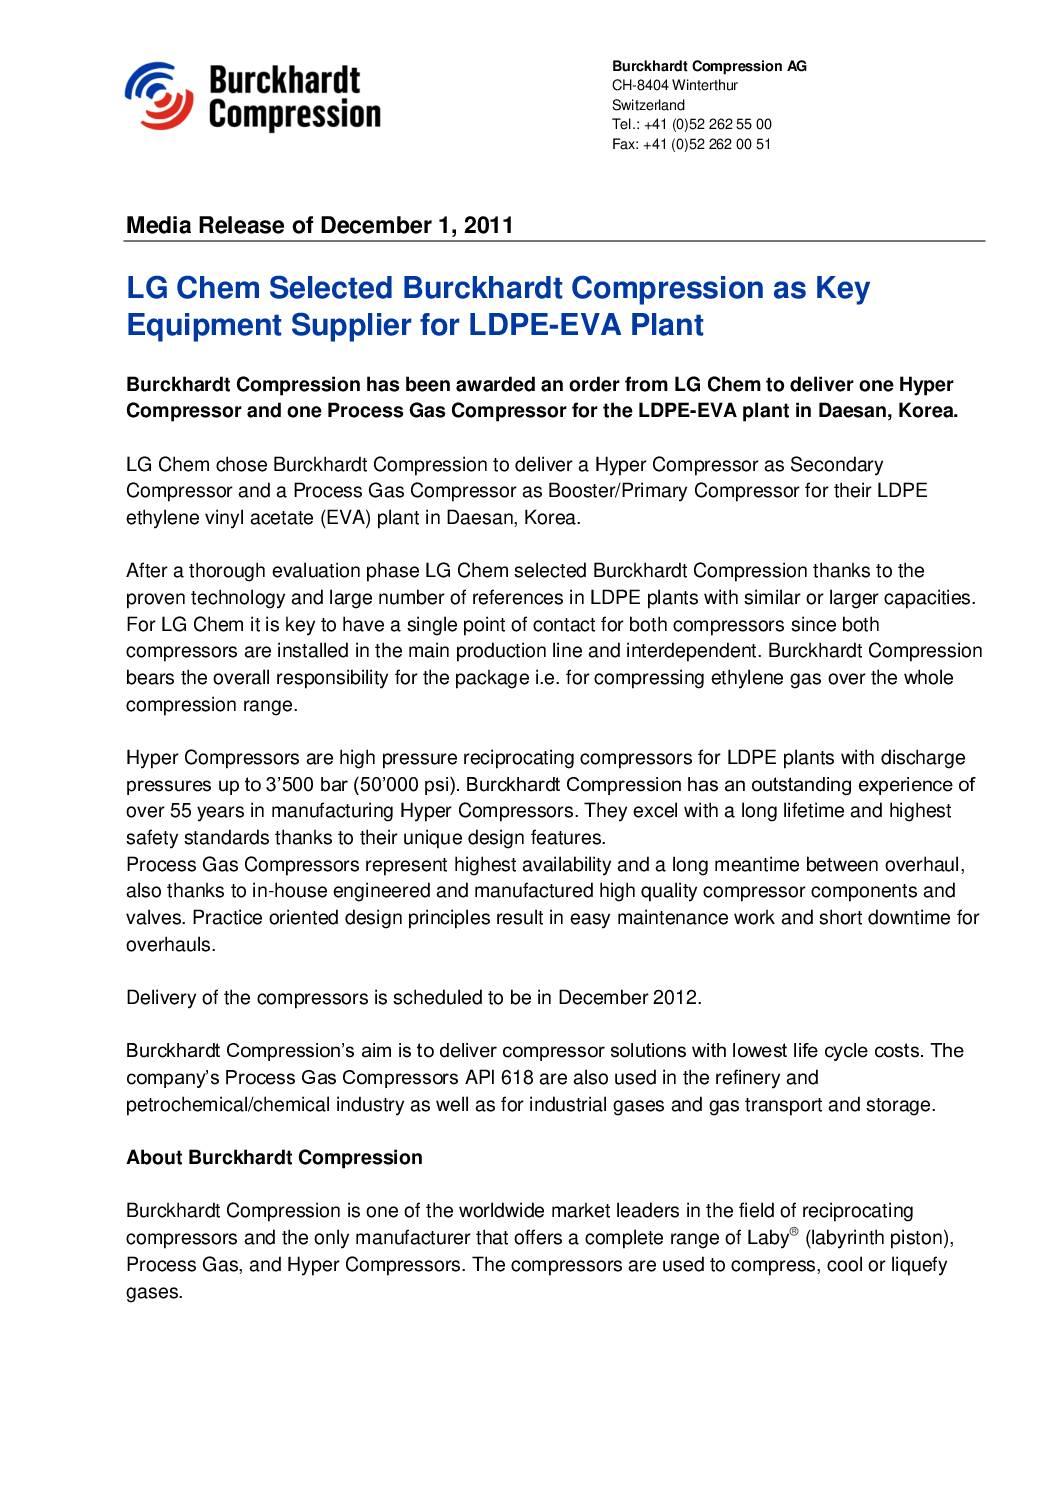 LG Chem Selected Burckhardt Compression as Key Equipment Supplier